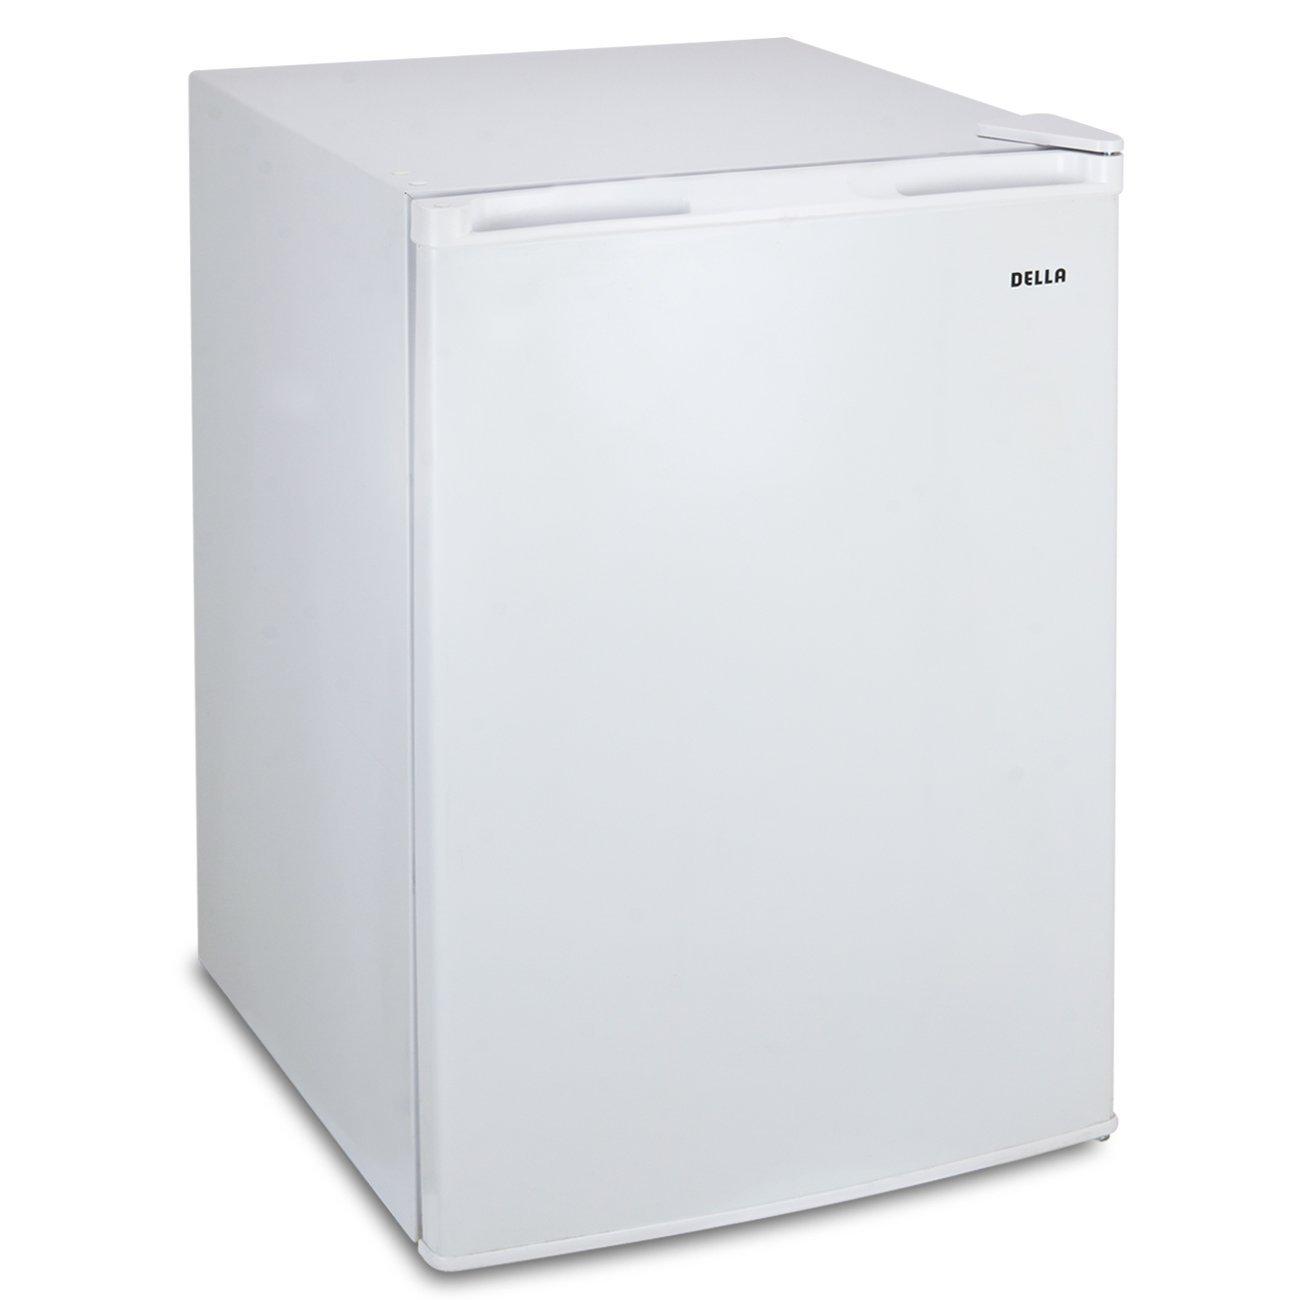 Della 4.5 cu. ft Single Reversible Door, Fridge Refrigerator Freezer Ice, White